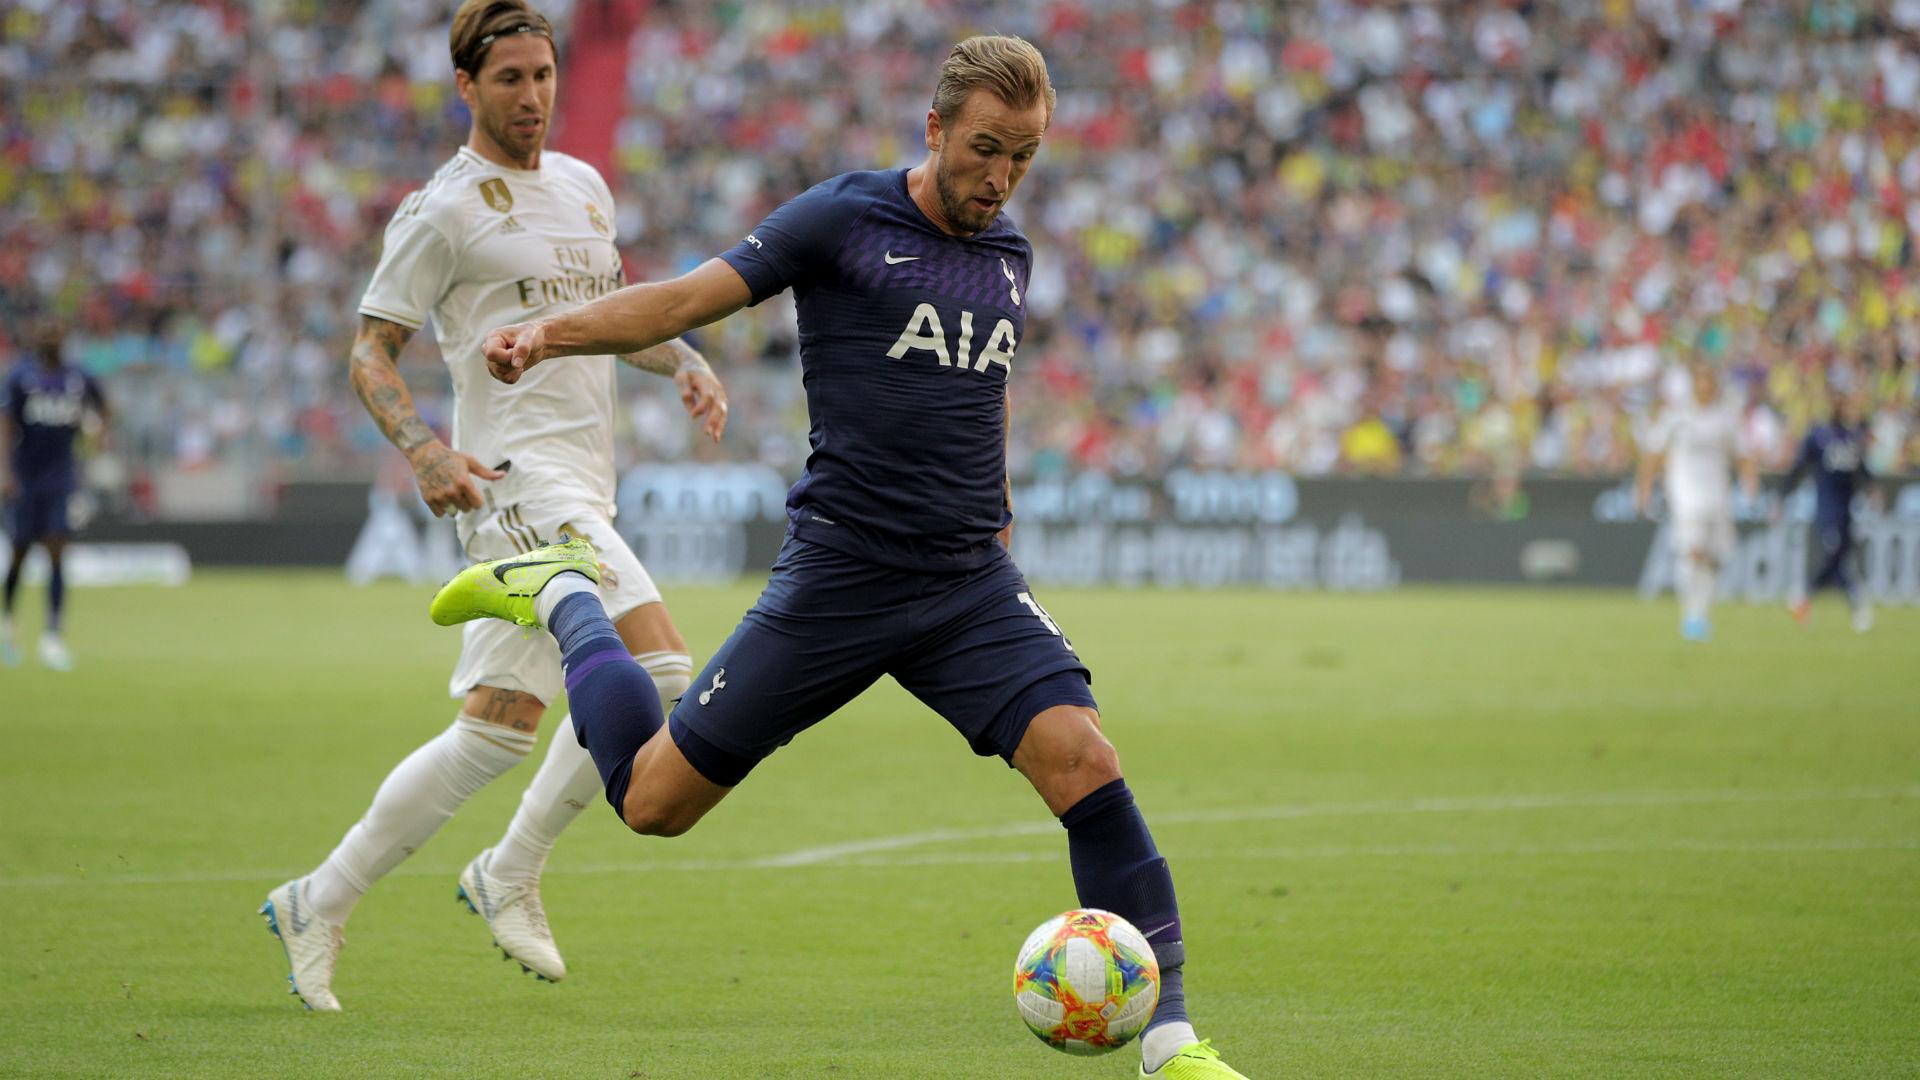 Audi Cup Real Madrid 0 1 Tottenham Harry Kane Goal Continues Poor Pre Season For Zidane S Side Goal Com